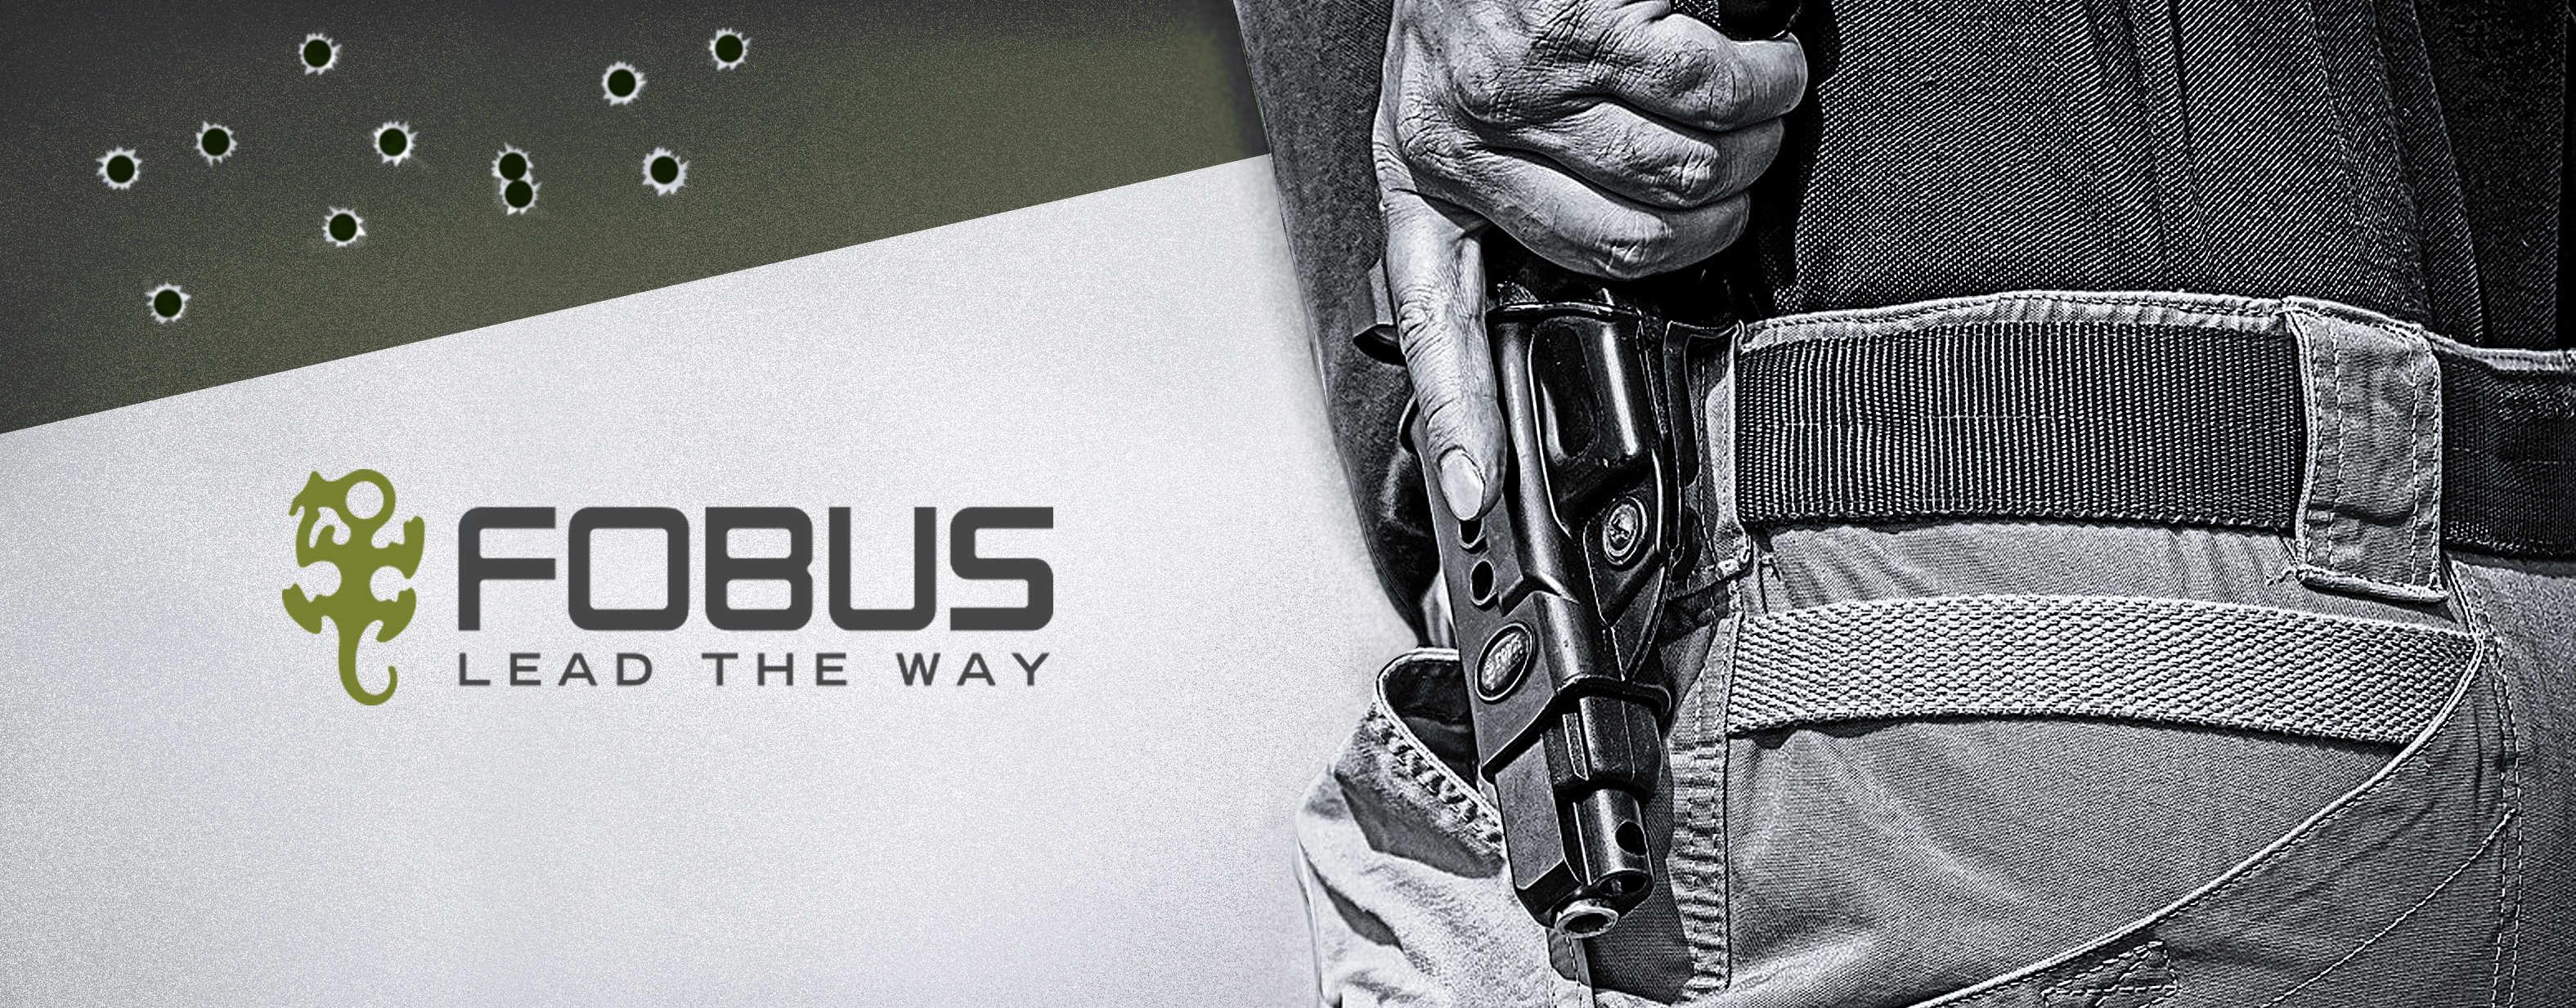 fobus-holster-tacticalasia.jpg